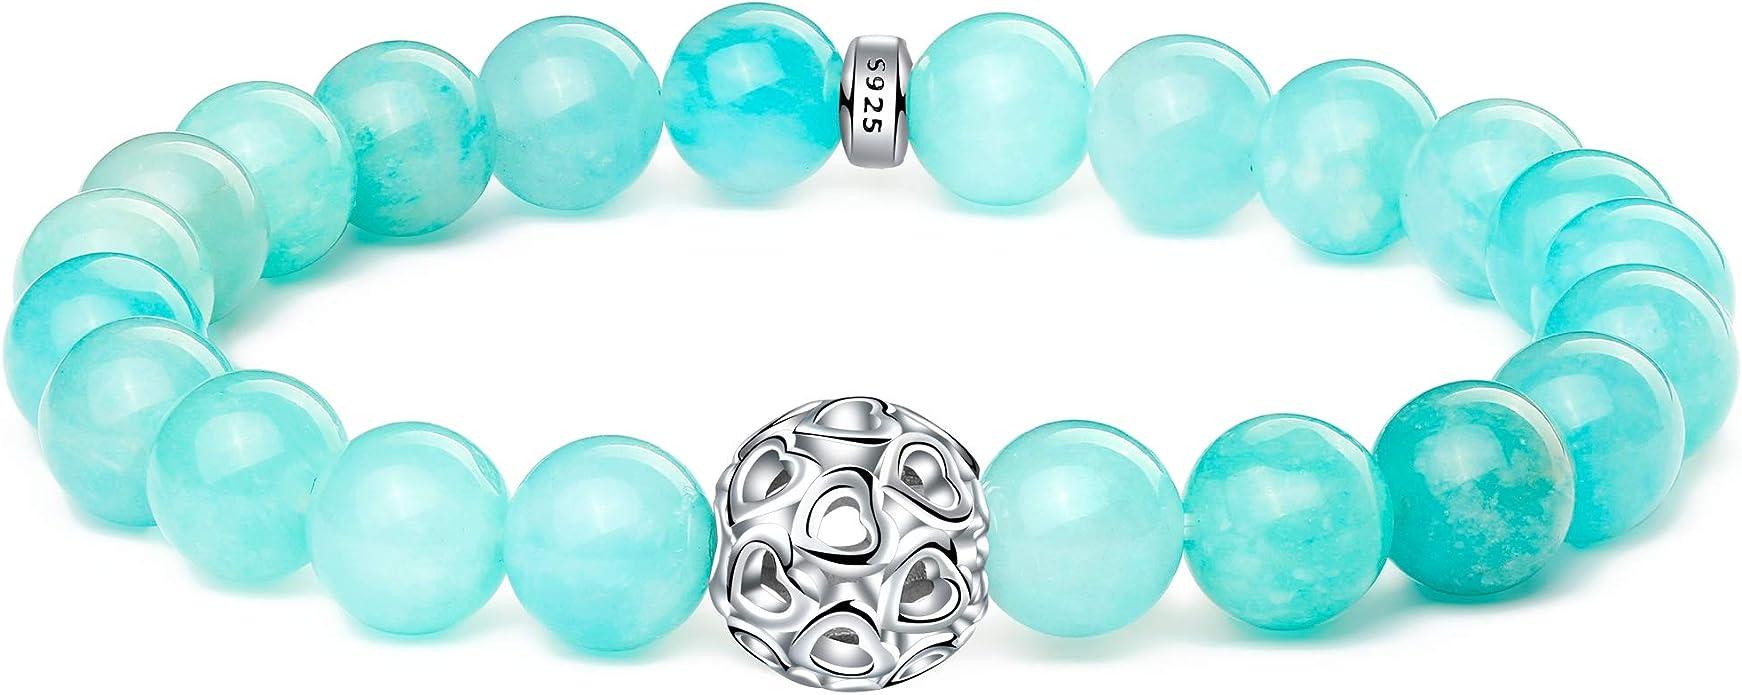 8mm Gemstone Bead Bracelet Genuine Gemstone Bracelet Sterling Silver Clasp Bracelet Amazonite Bracelet Matte Frosted Gemstone Bead